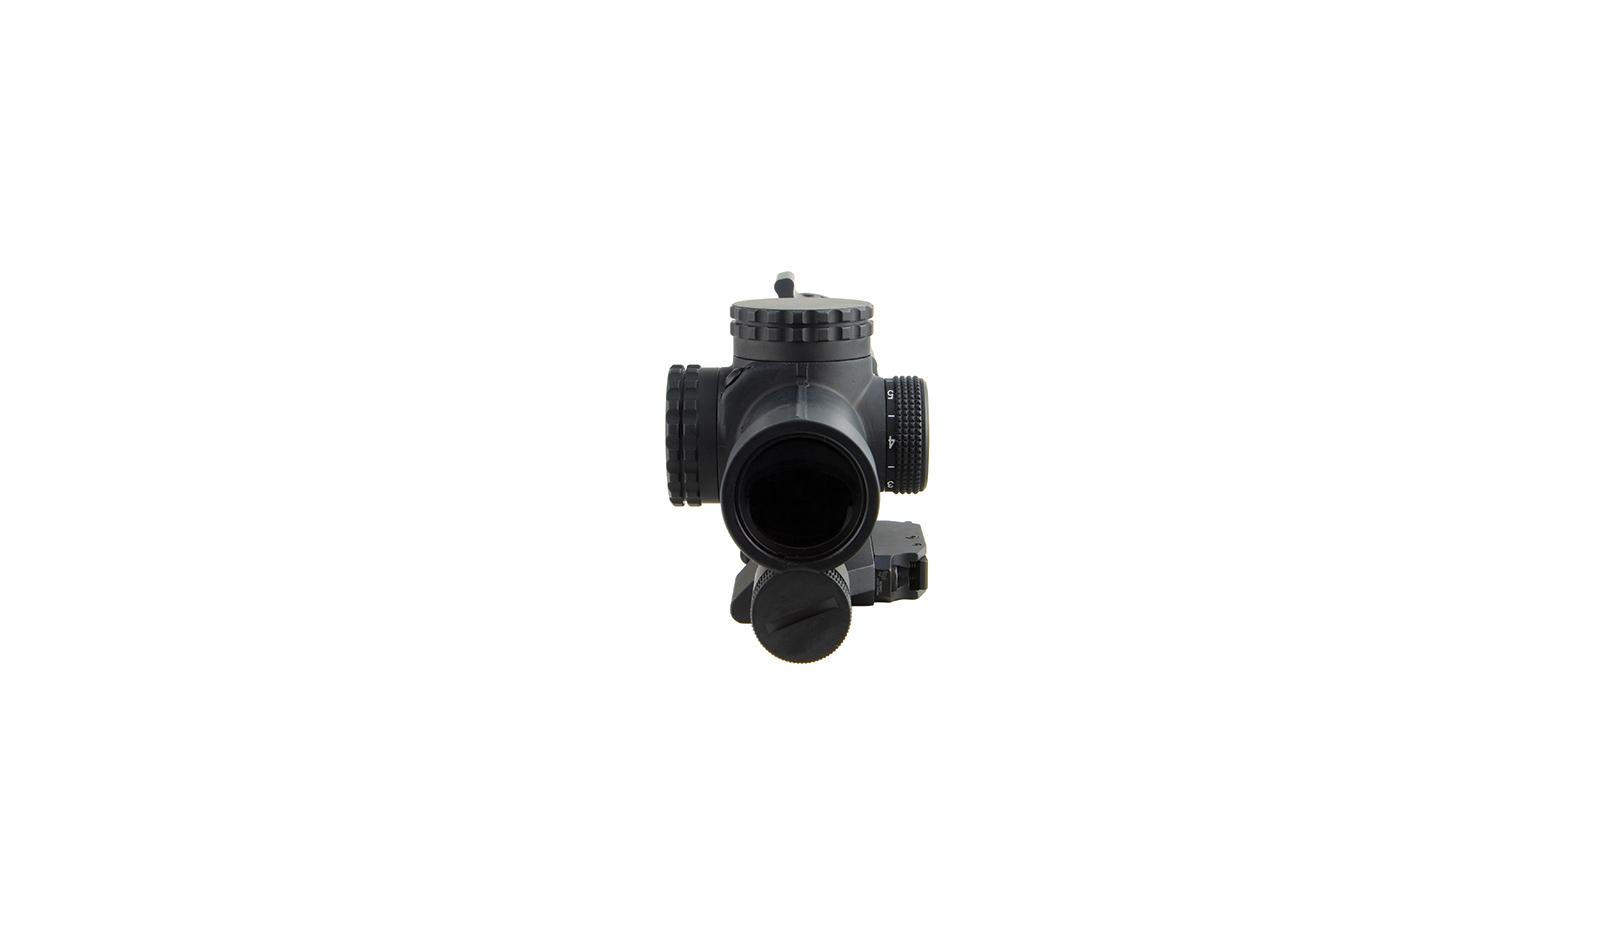 VC16-C-1600053 angle 8